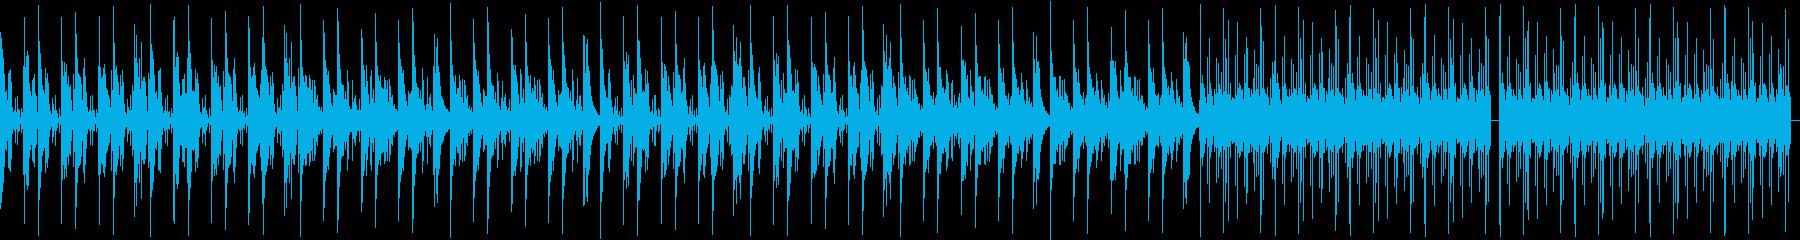 148bpm、Ab-min、不思議な感じの再生済みの波形